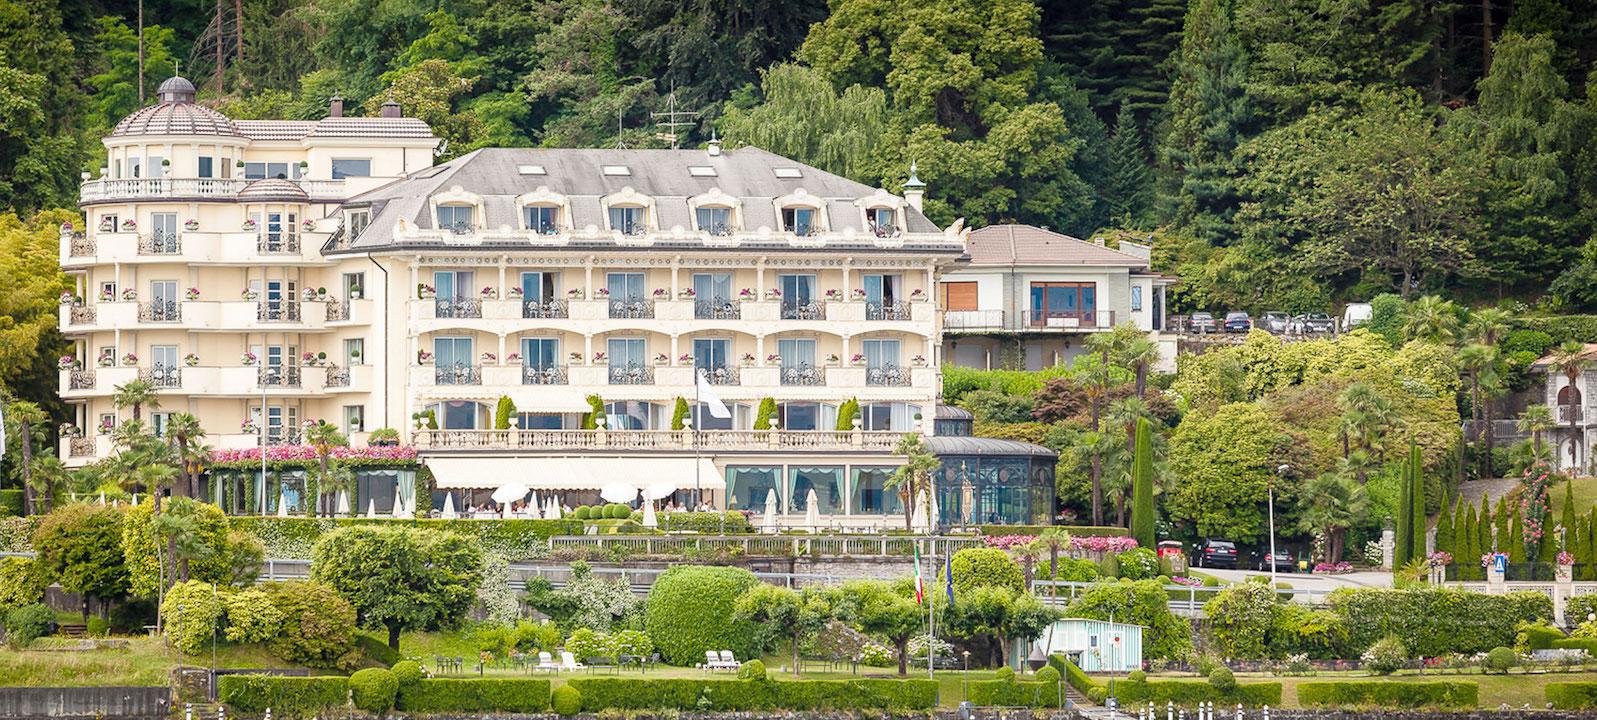 Villa and Palazzo Aminta , Lake Maggiore / Italy